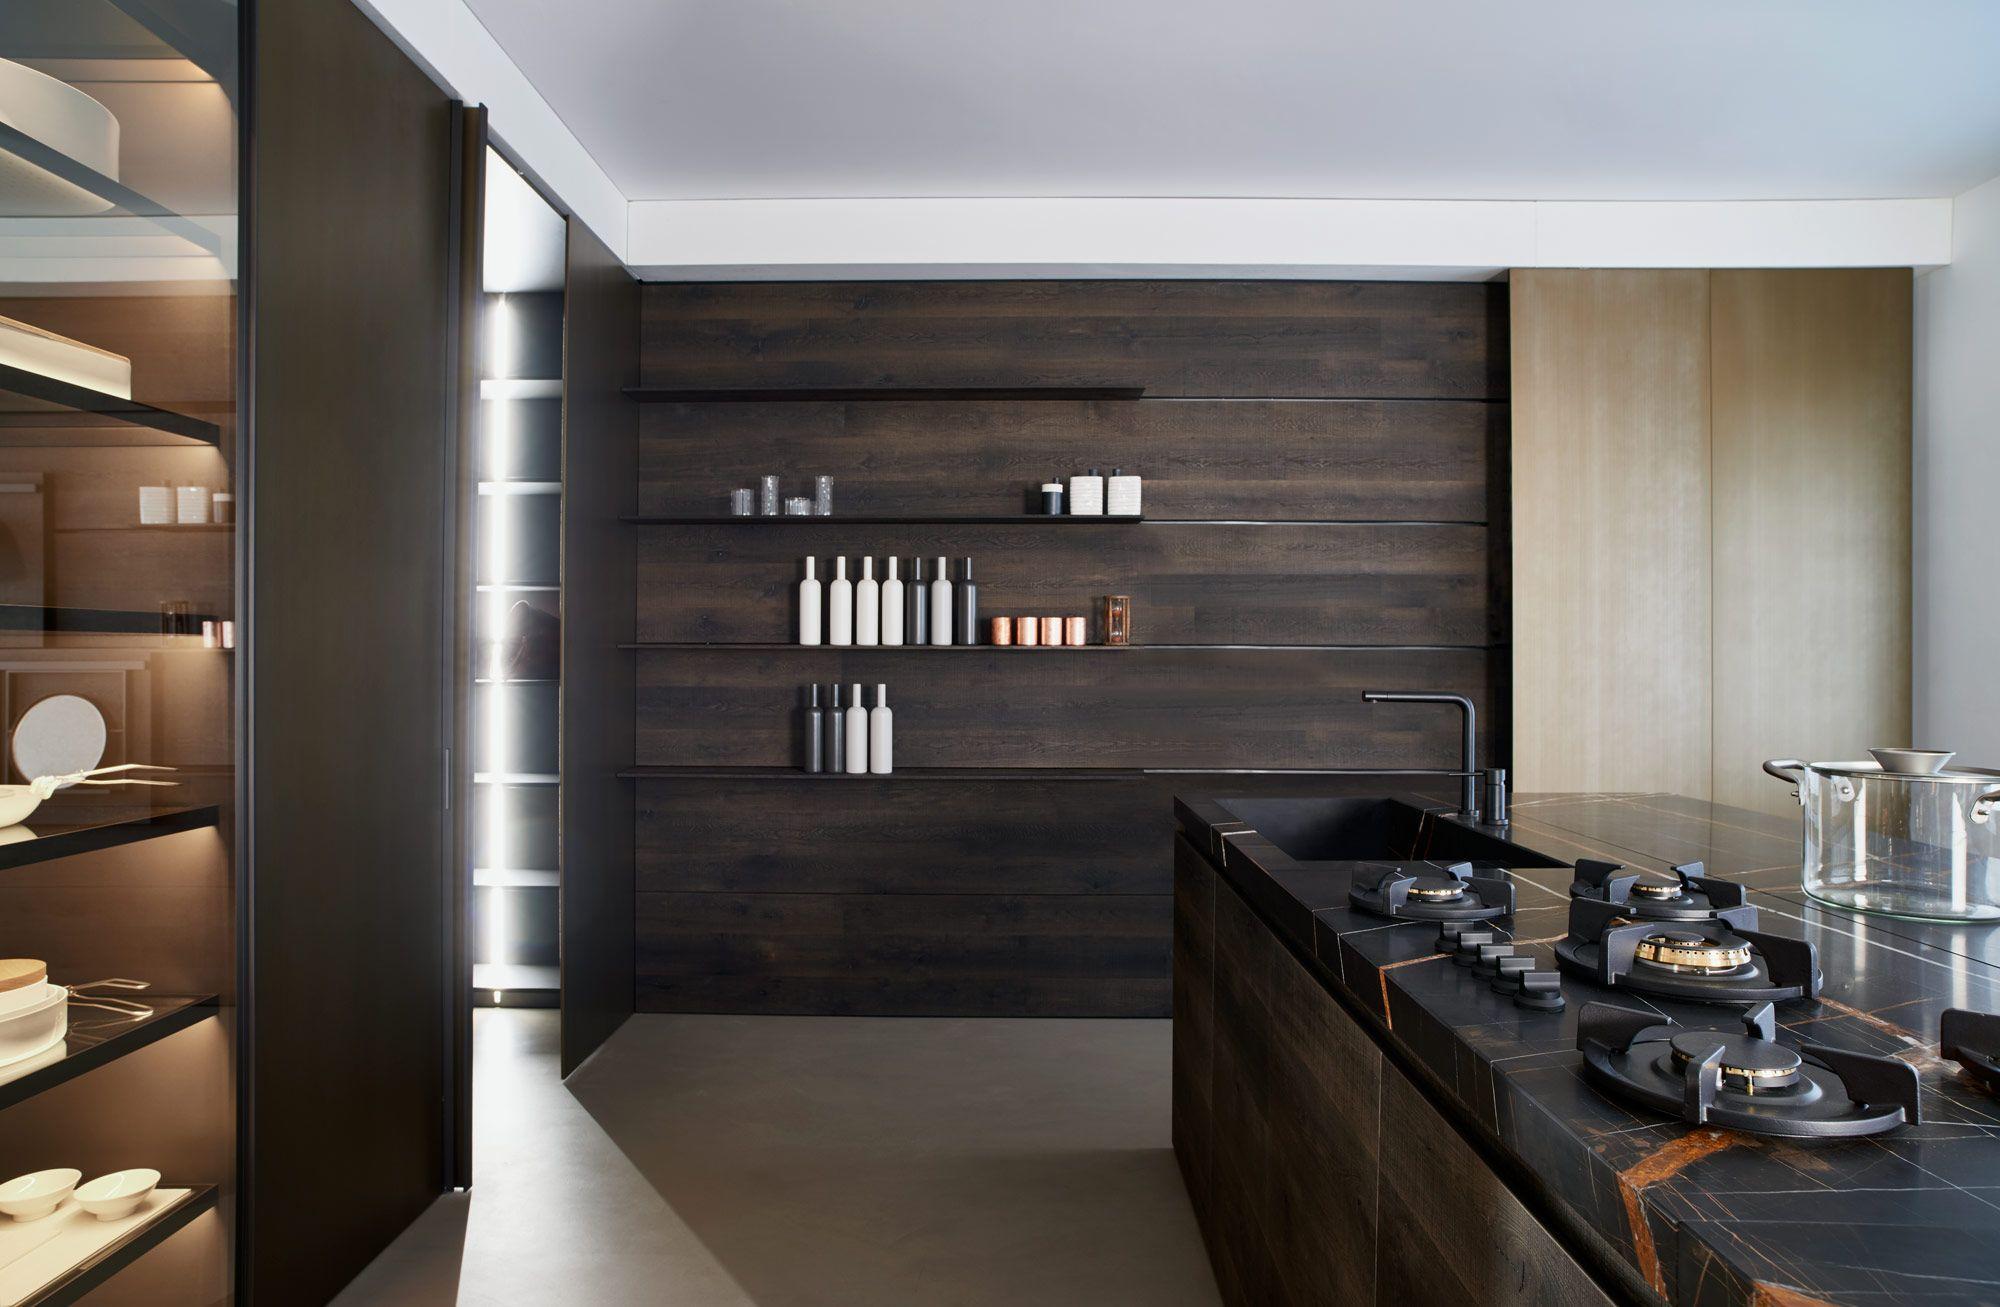 Cucina Estivale > un progetto di Key Sbabo Cucine | plyta ...